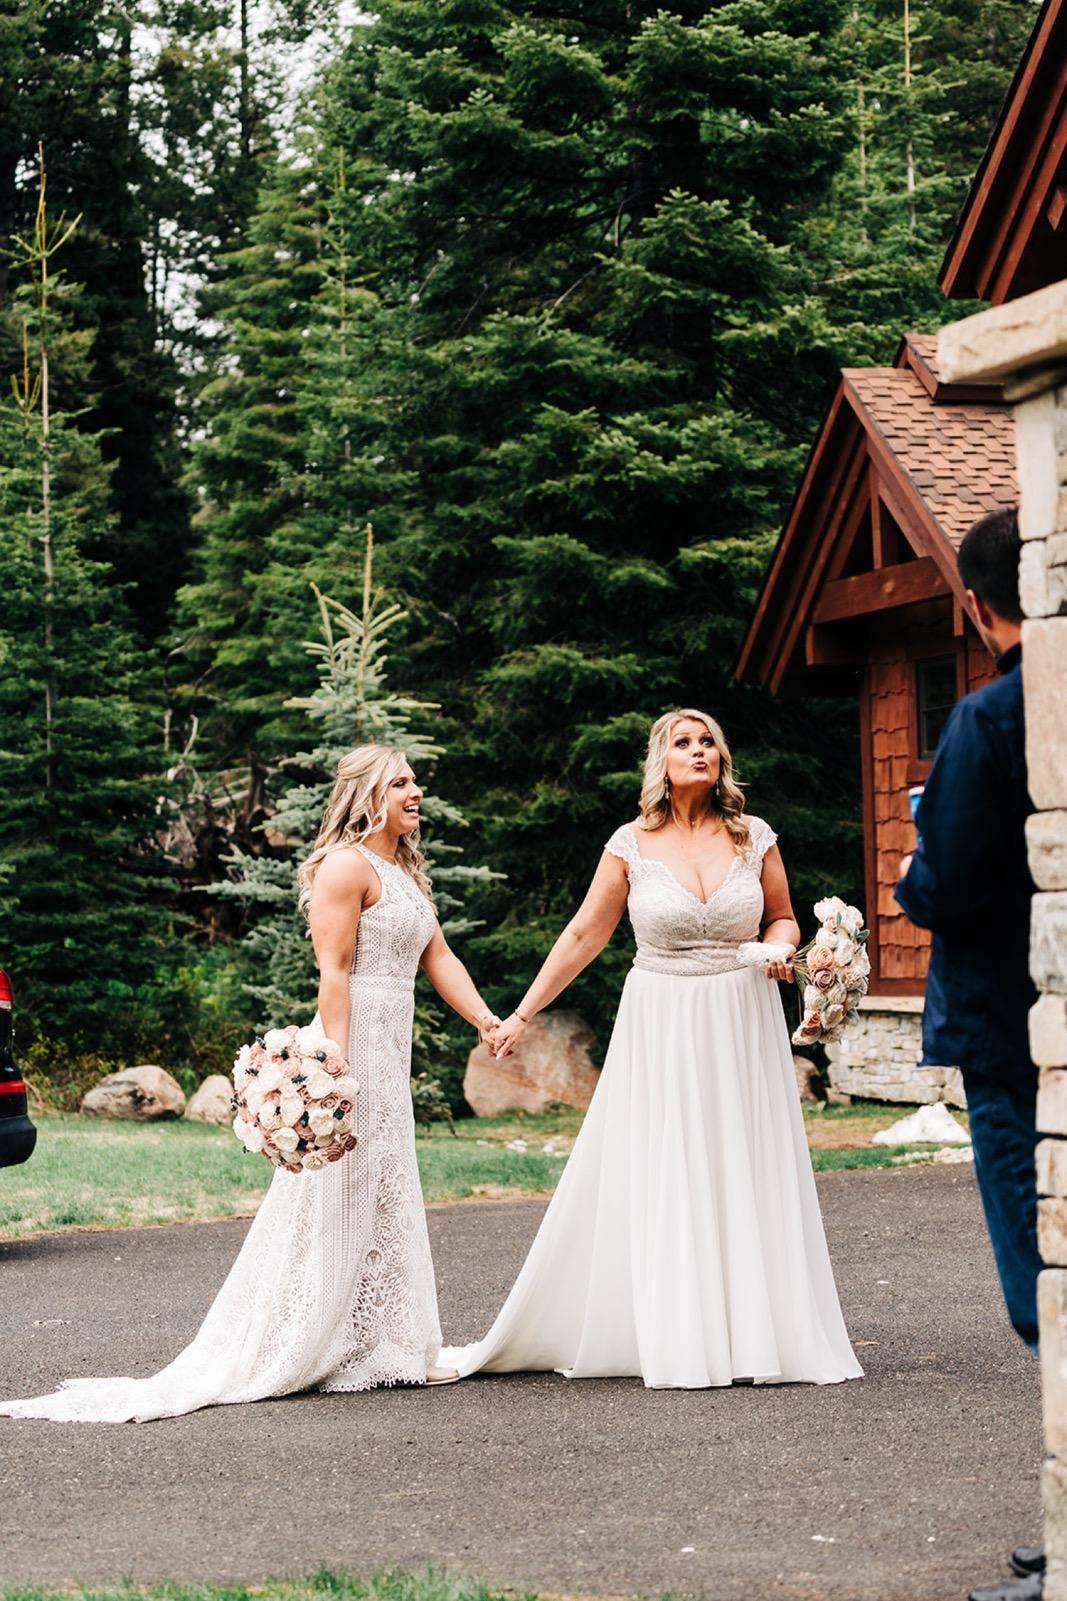 096_falissa_heather_wedding-242.jpg